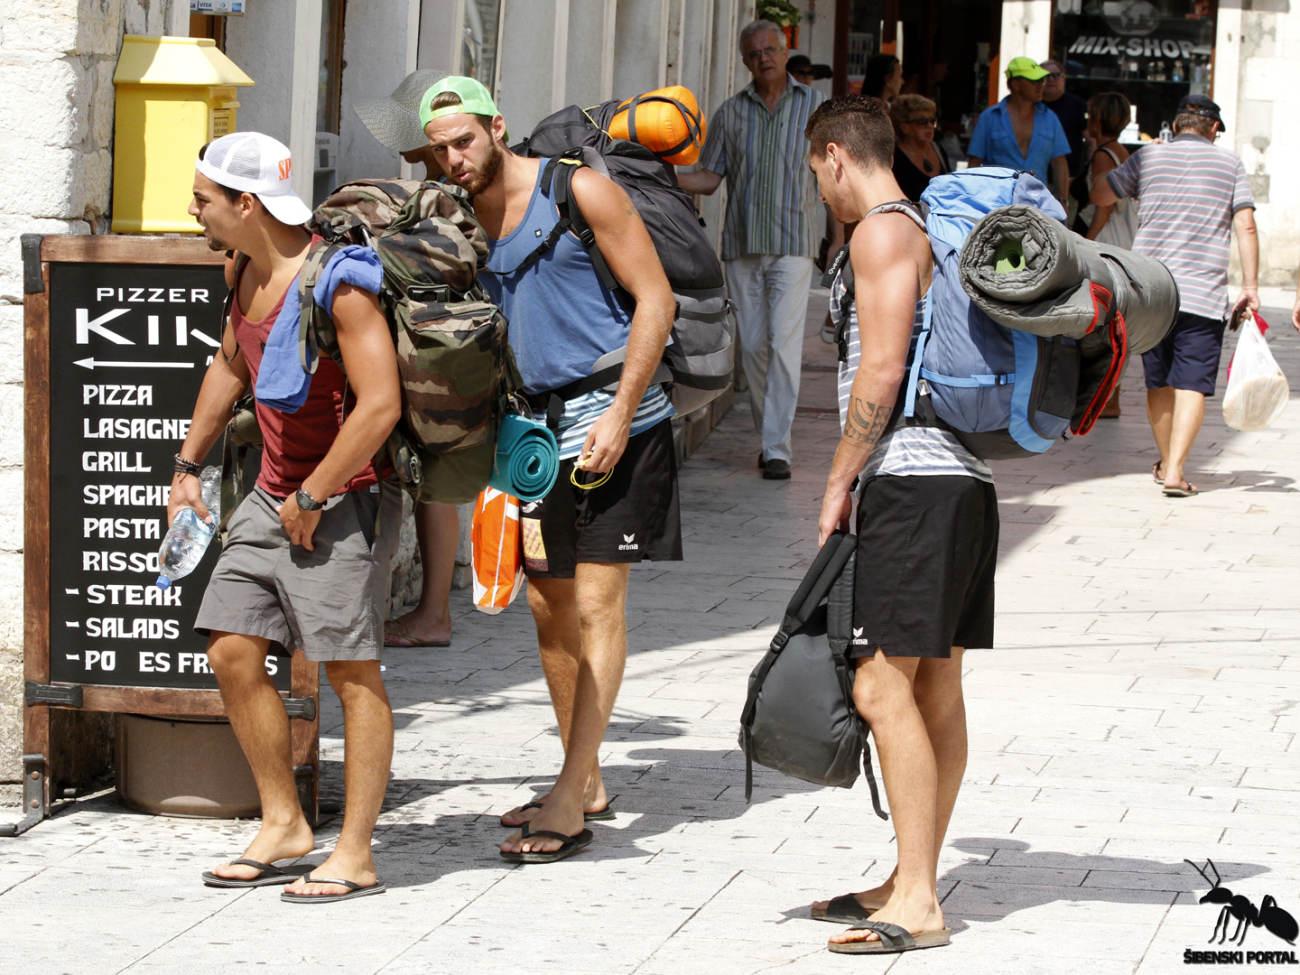 spica turisti 1 100815